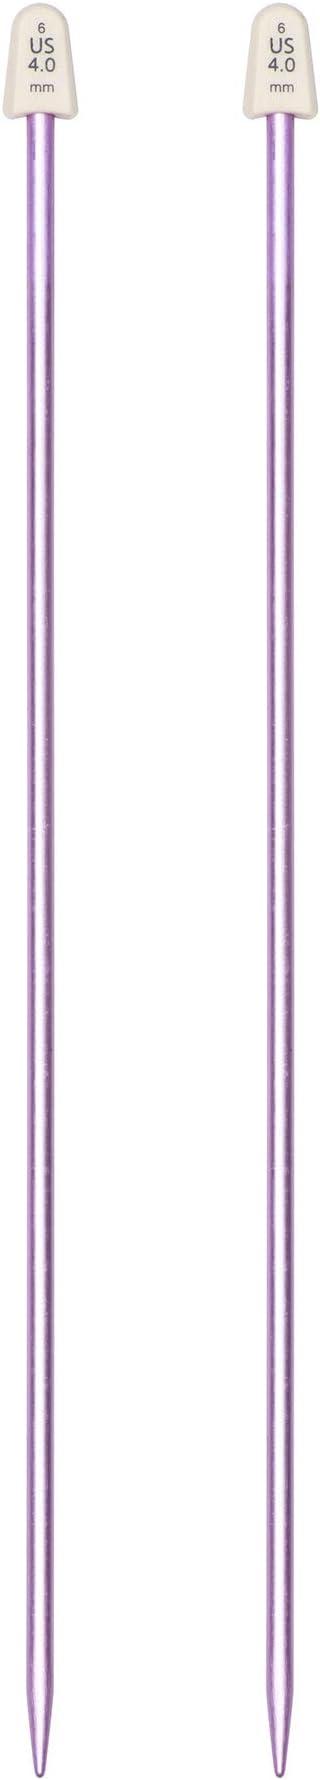 Lavender Susan Bates 10-Inch Silvalume Single Point Knitting Needle 4mm